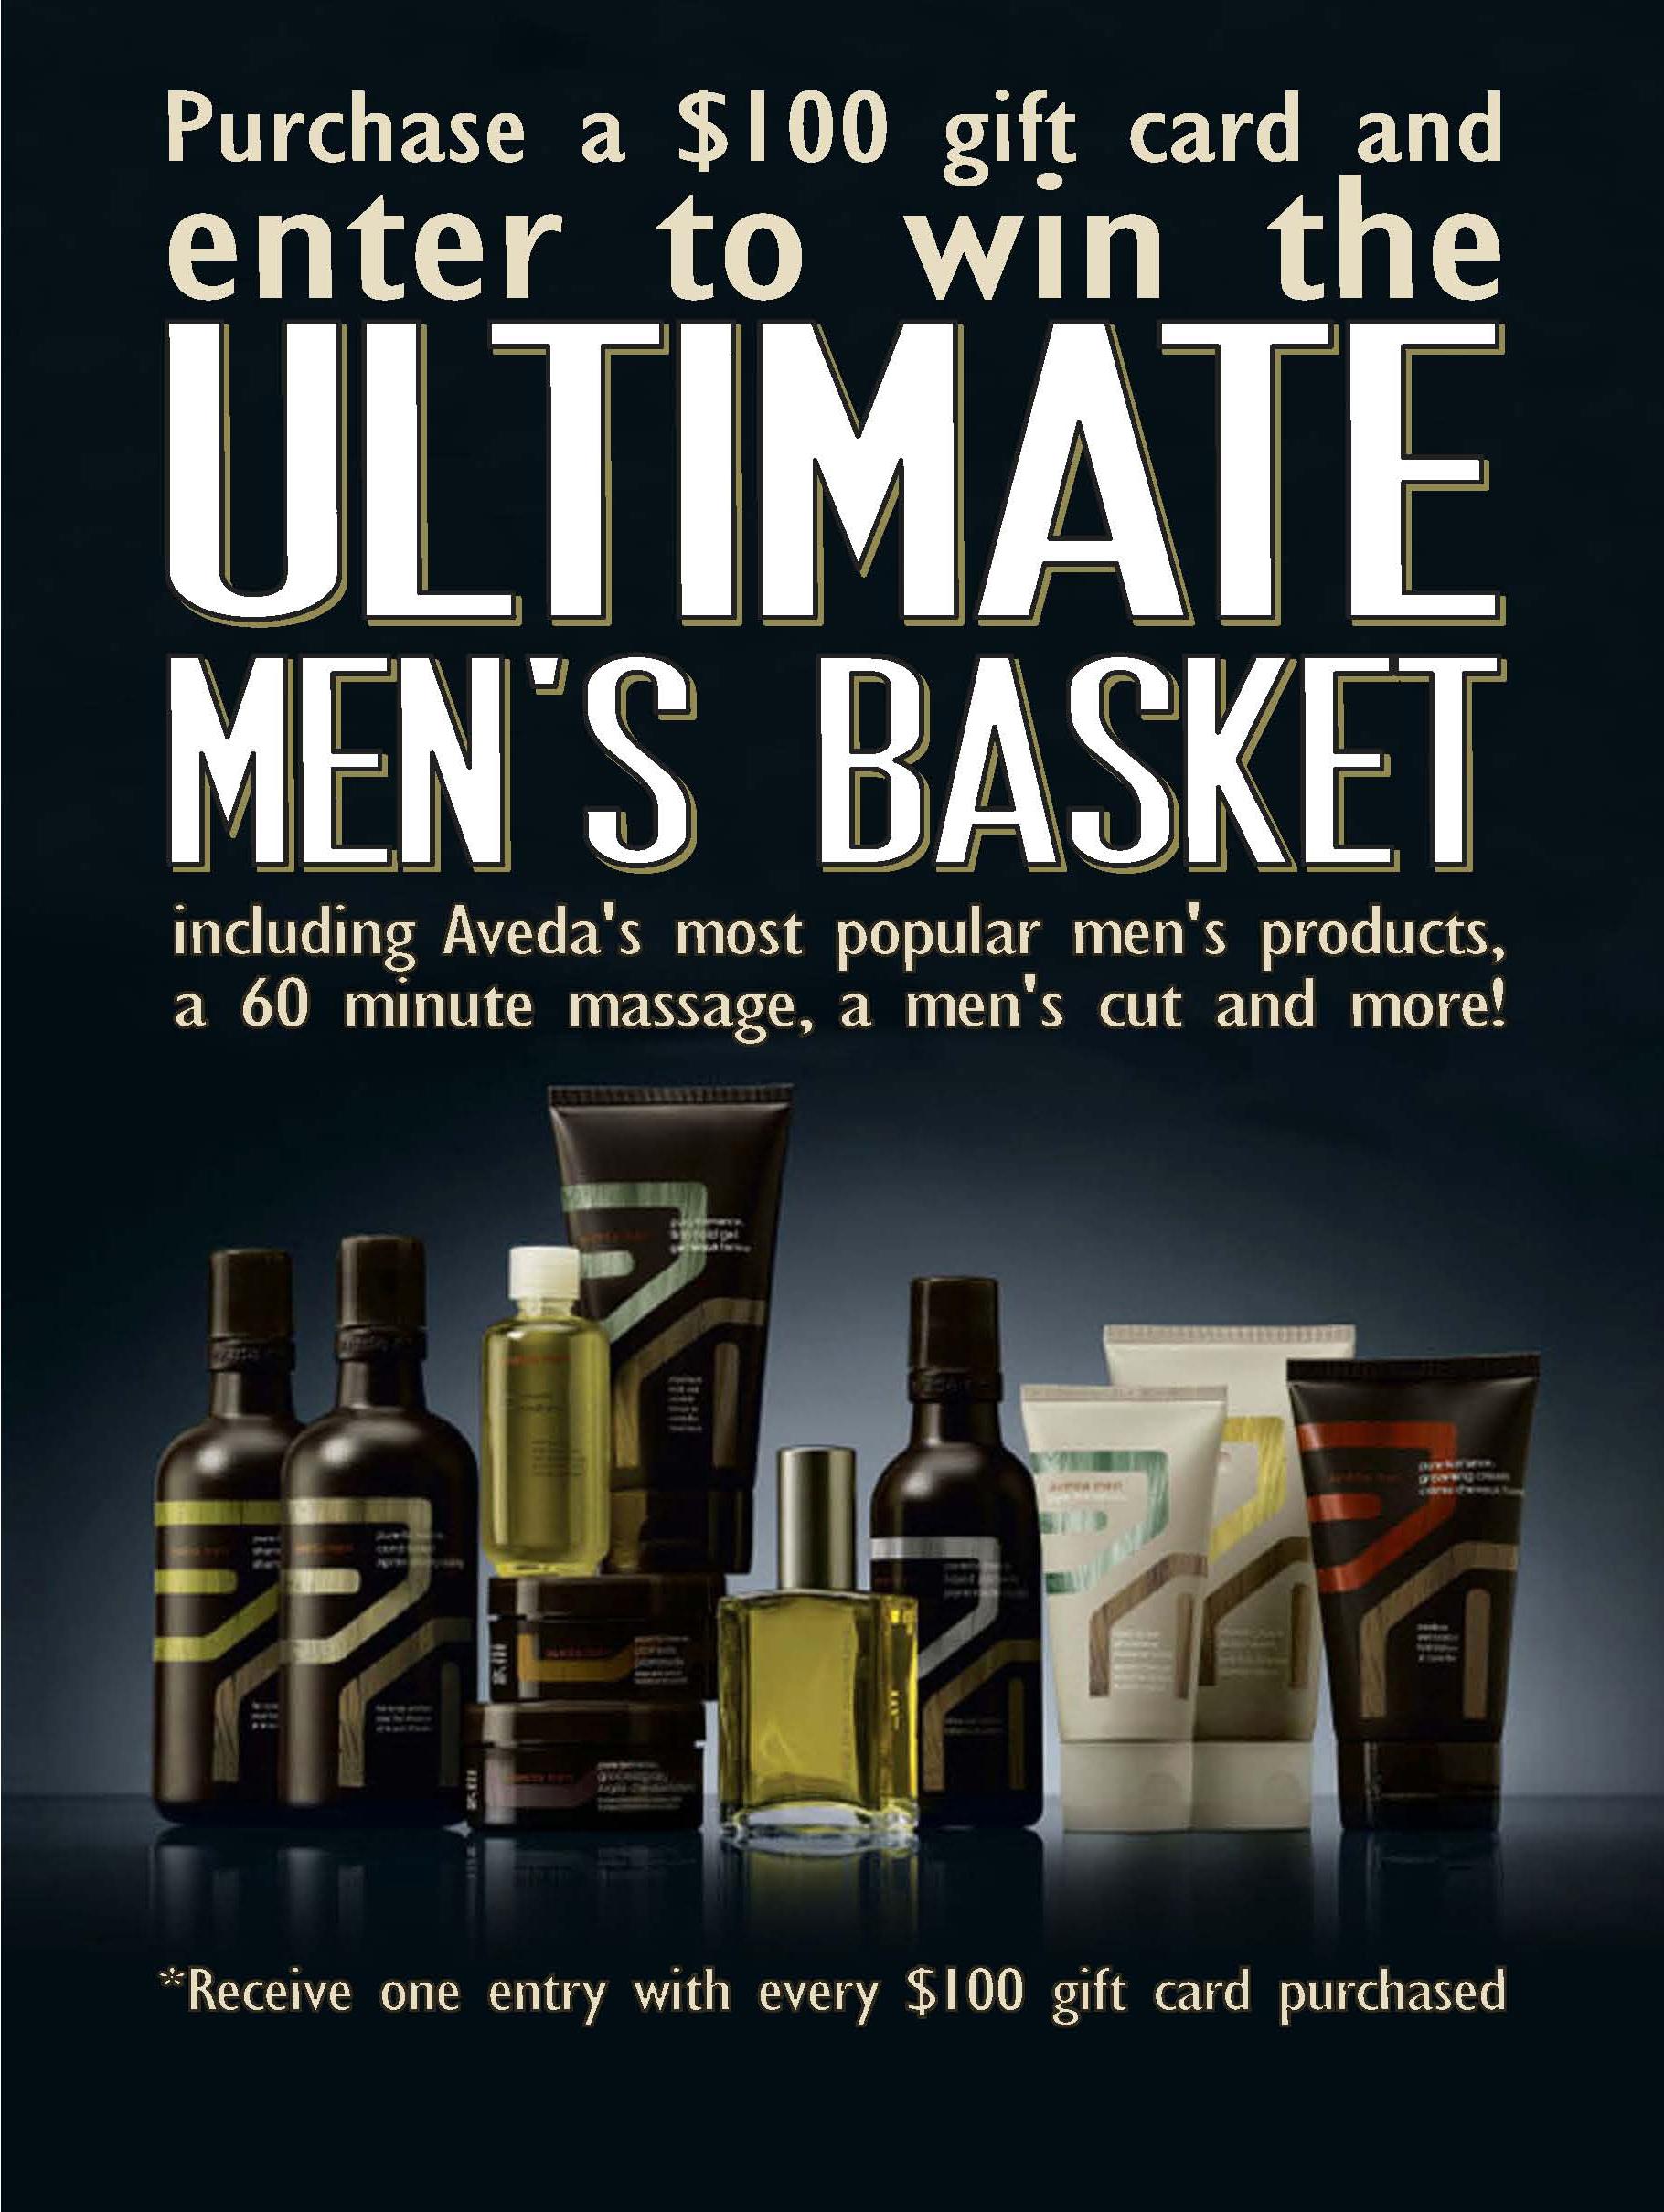 fathers day - ultimate mens basket school facebook.jpg